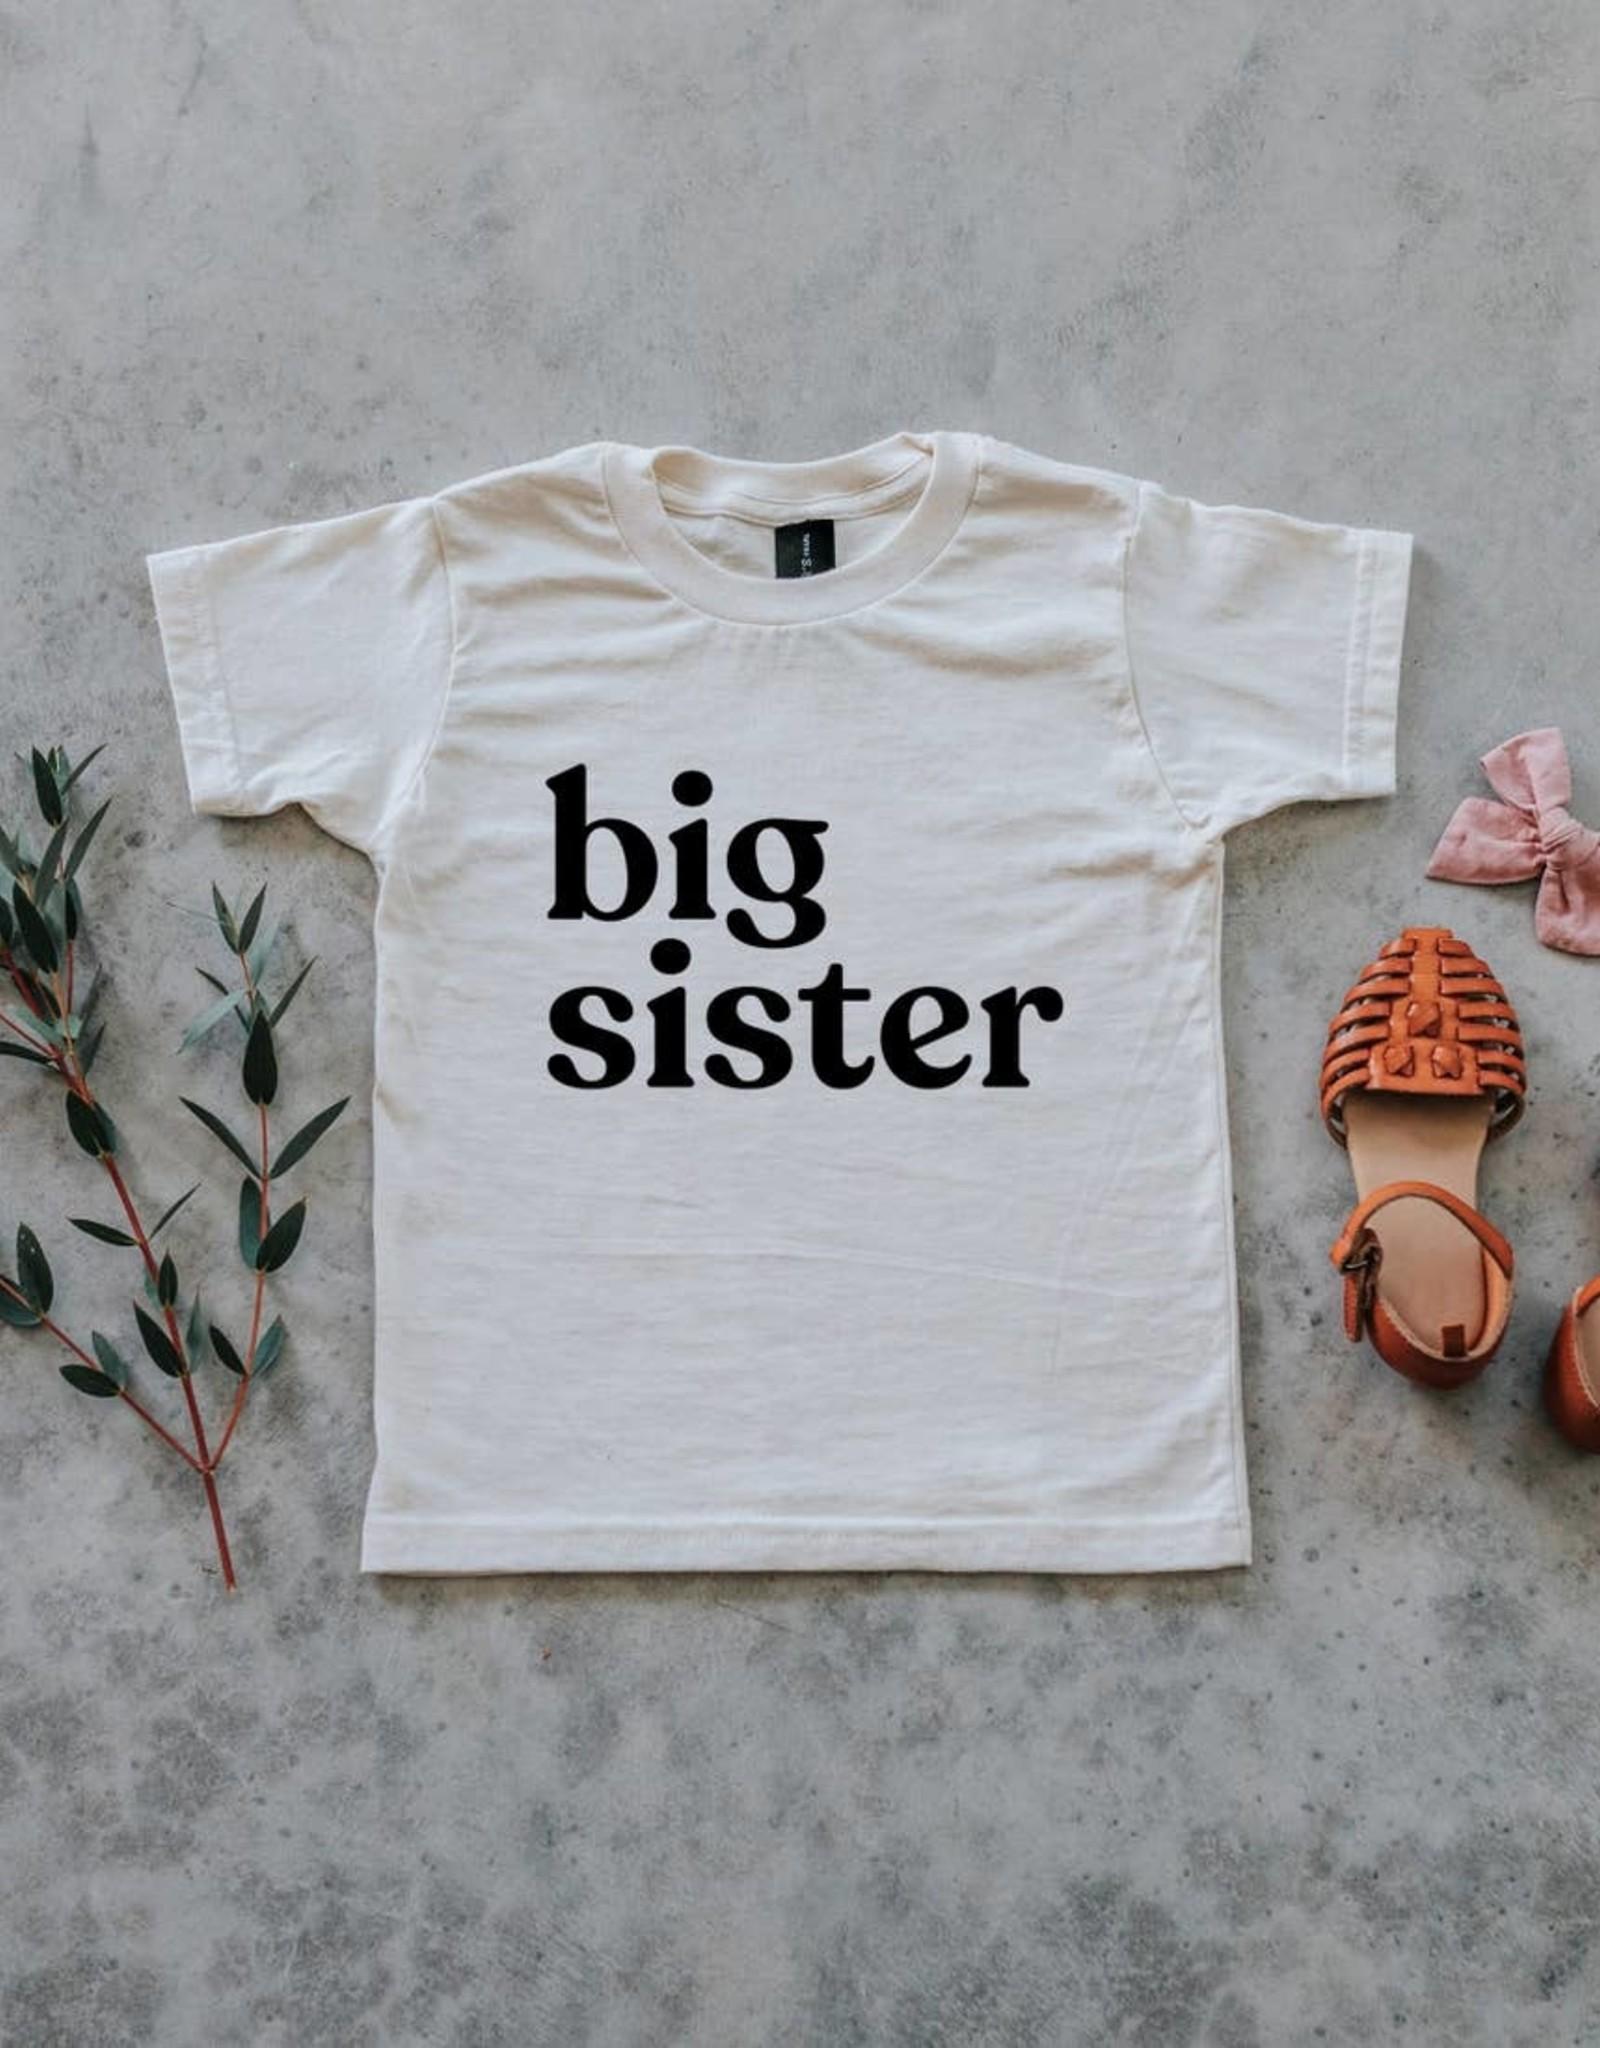 Big Sister Tee in Cream